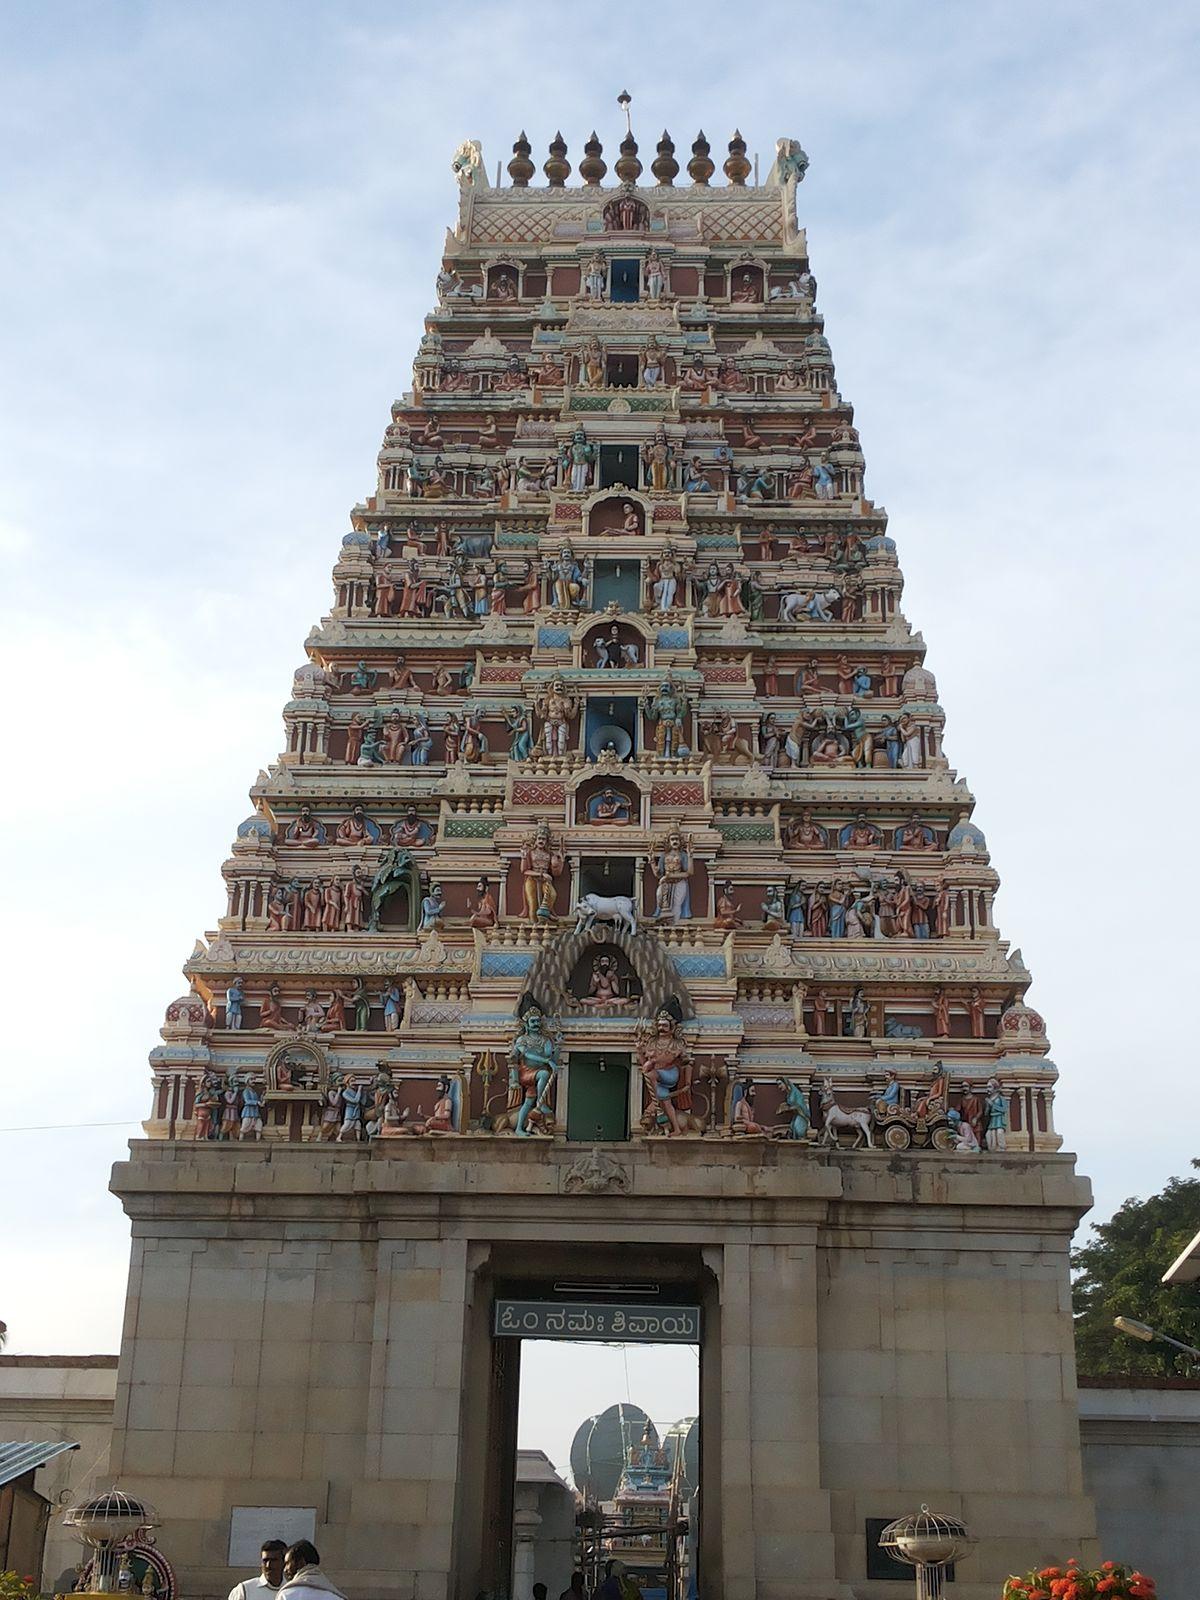 Yediyur Siddhalingeshwara Swamy Temple - Wikipedia